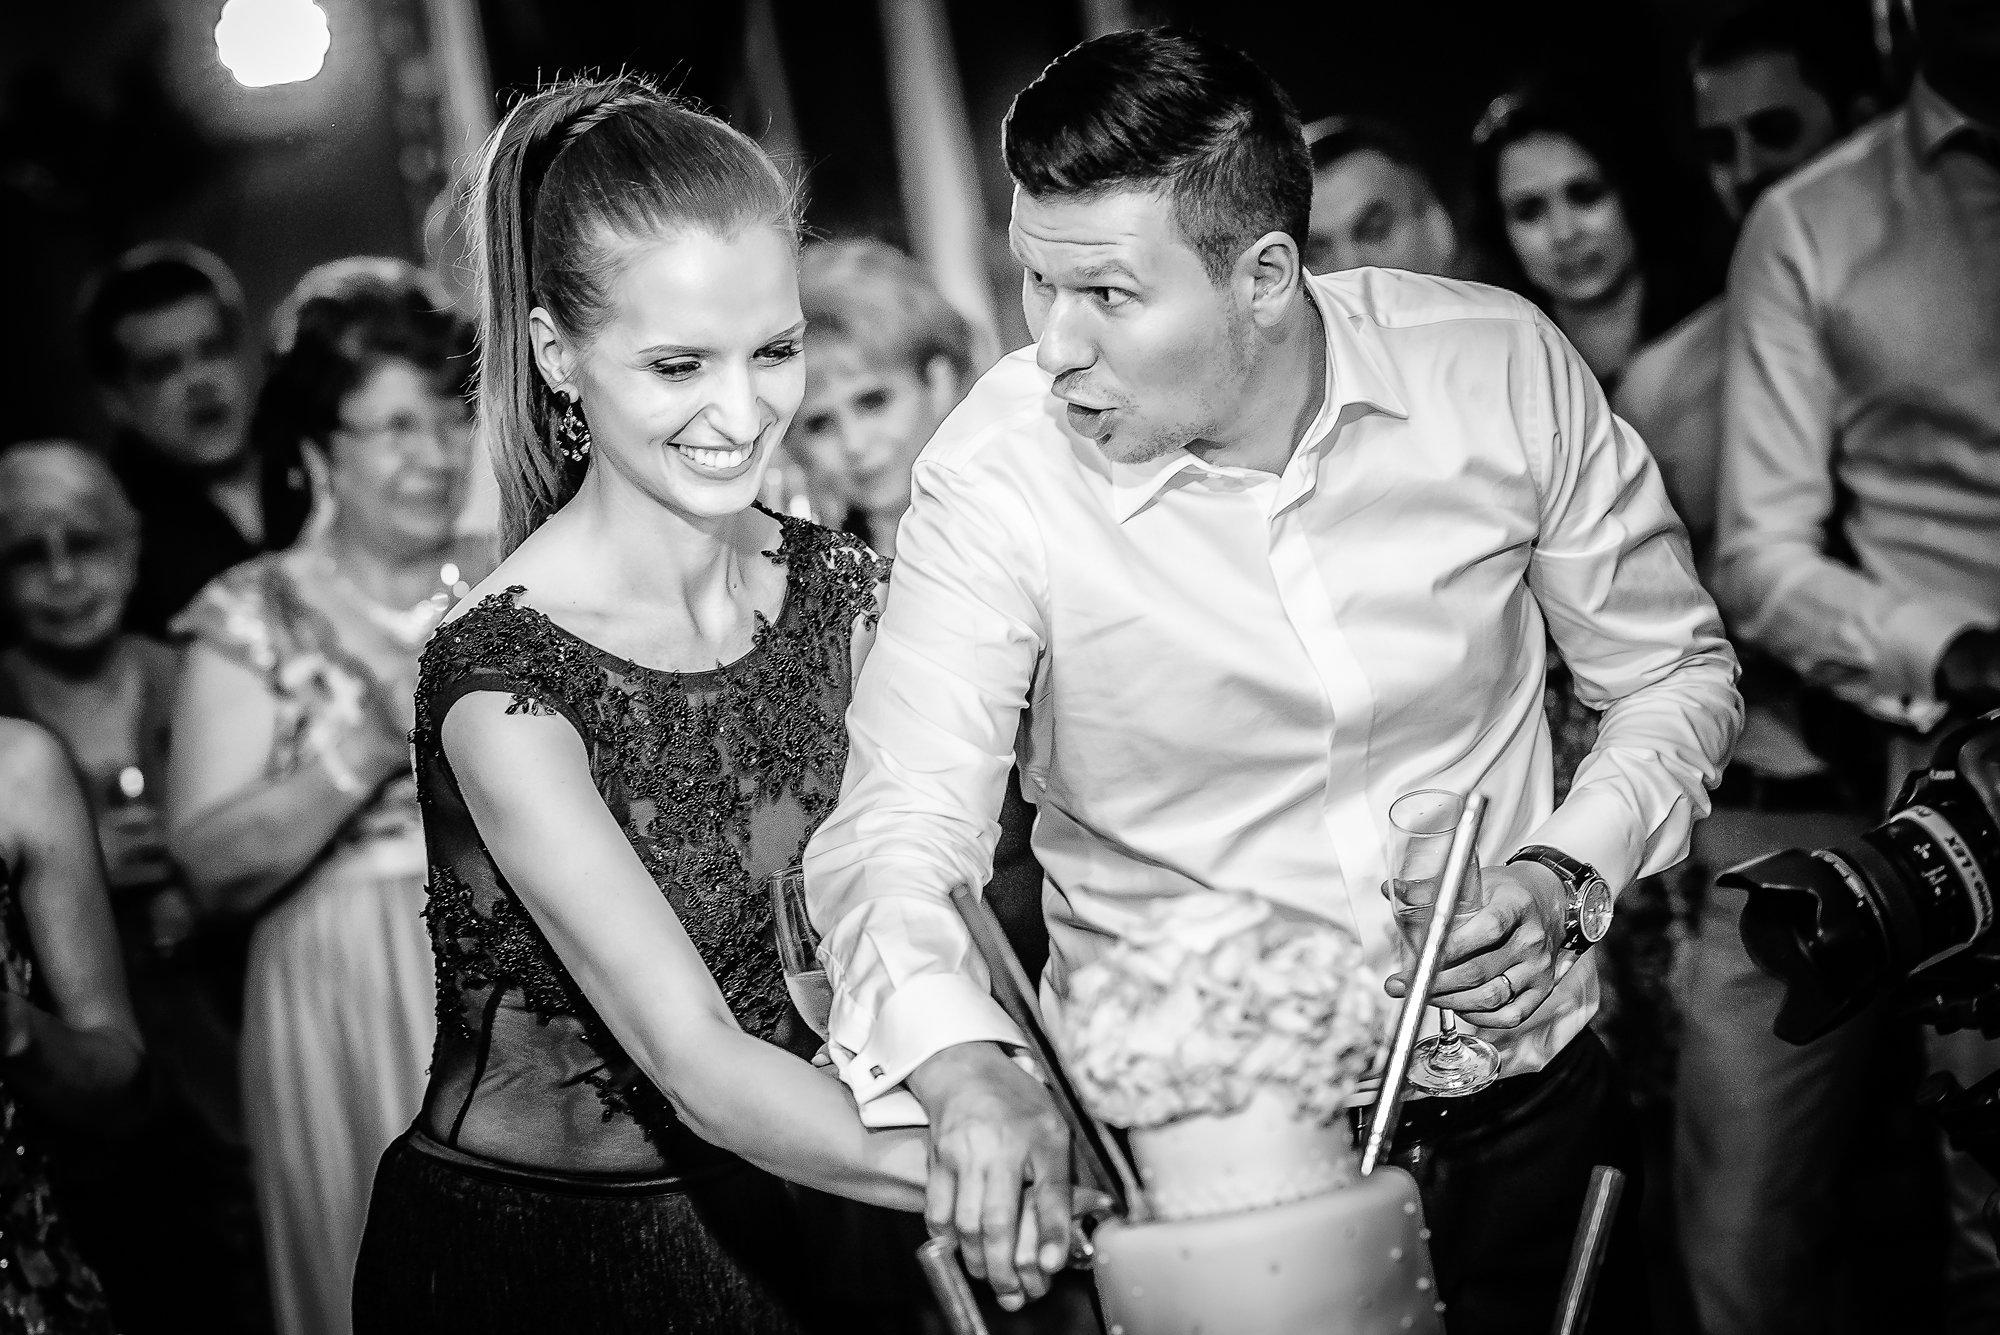 alexandru madalina wedding day 59